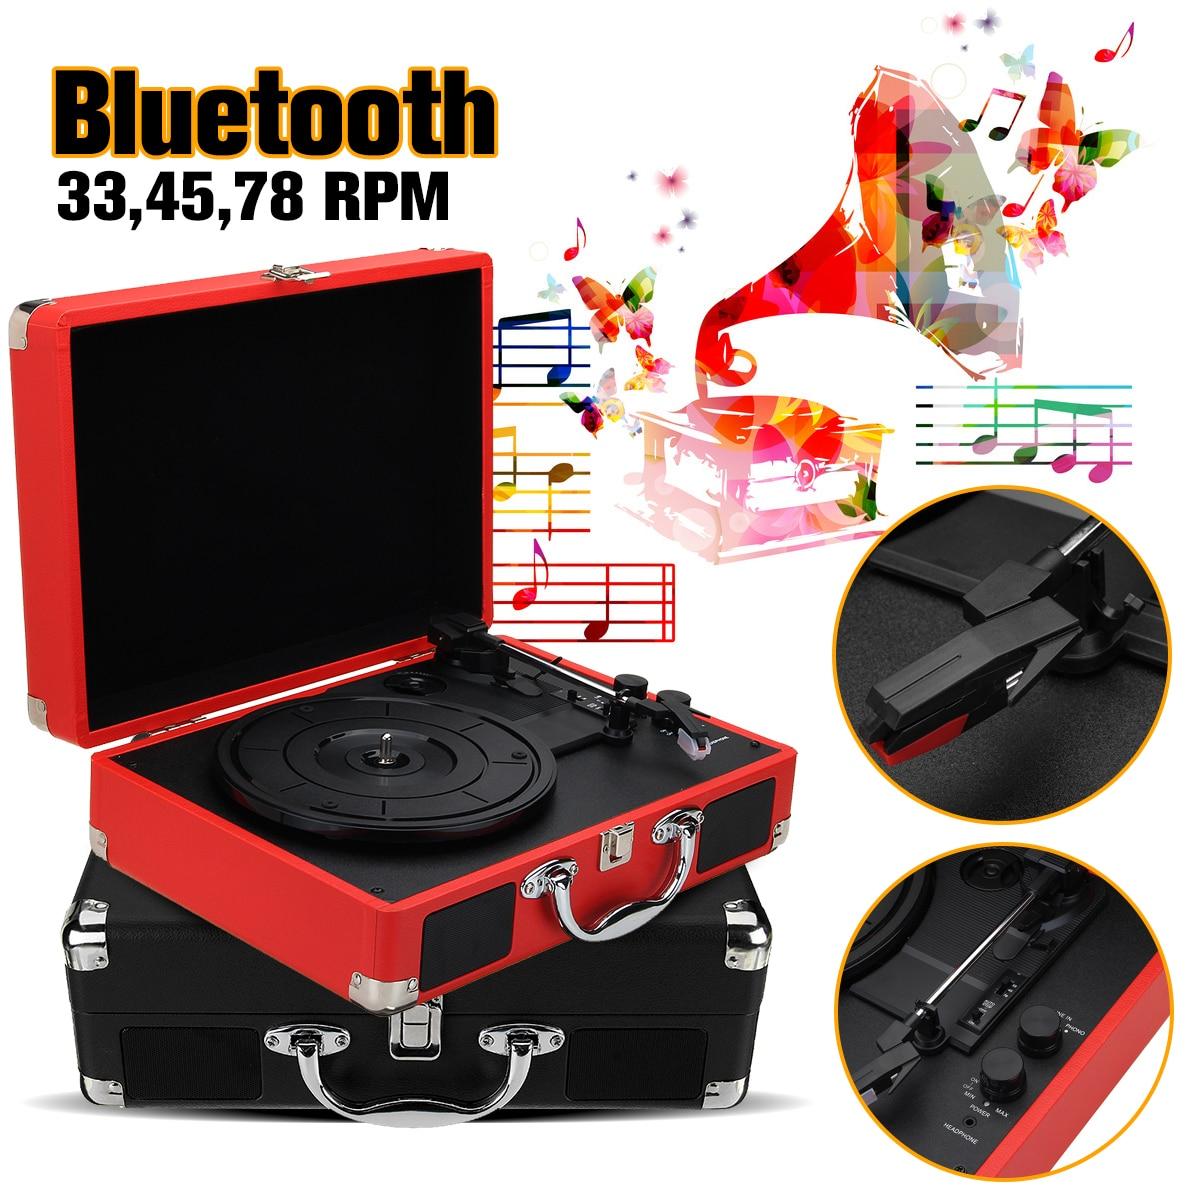 Plastic Wood Retro 33/45/78 RPM bluetooth PH/ INT/ BT 2.0 Suitcase Turntable Vinyl LP Record Phone Player 3 Speed 3.5mm AUX IN